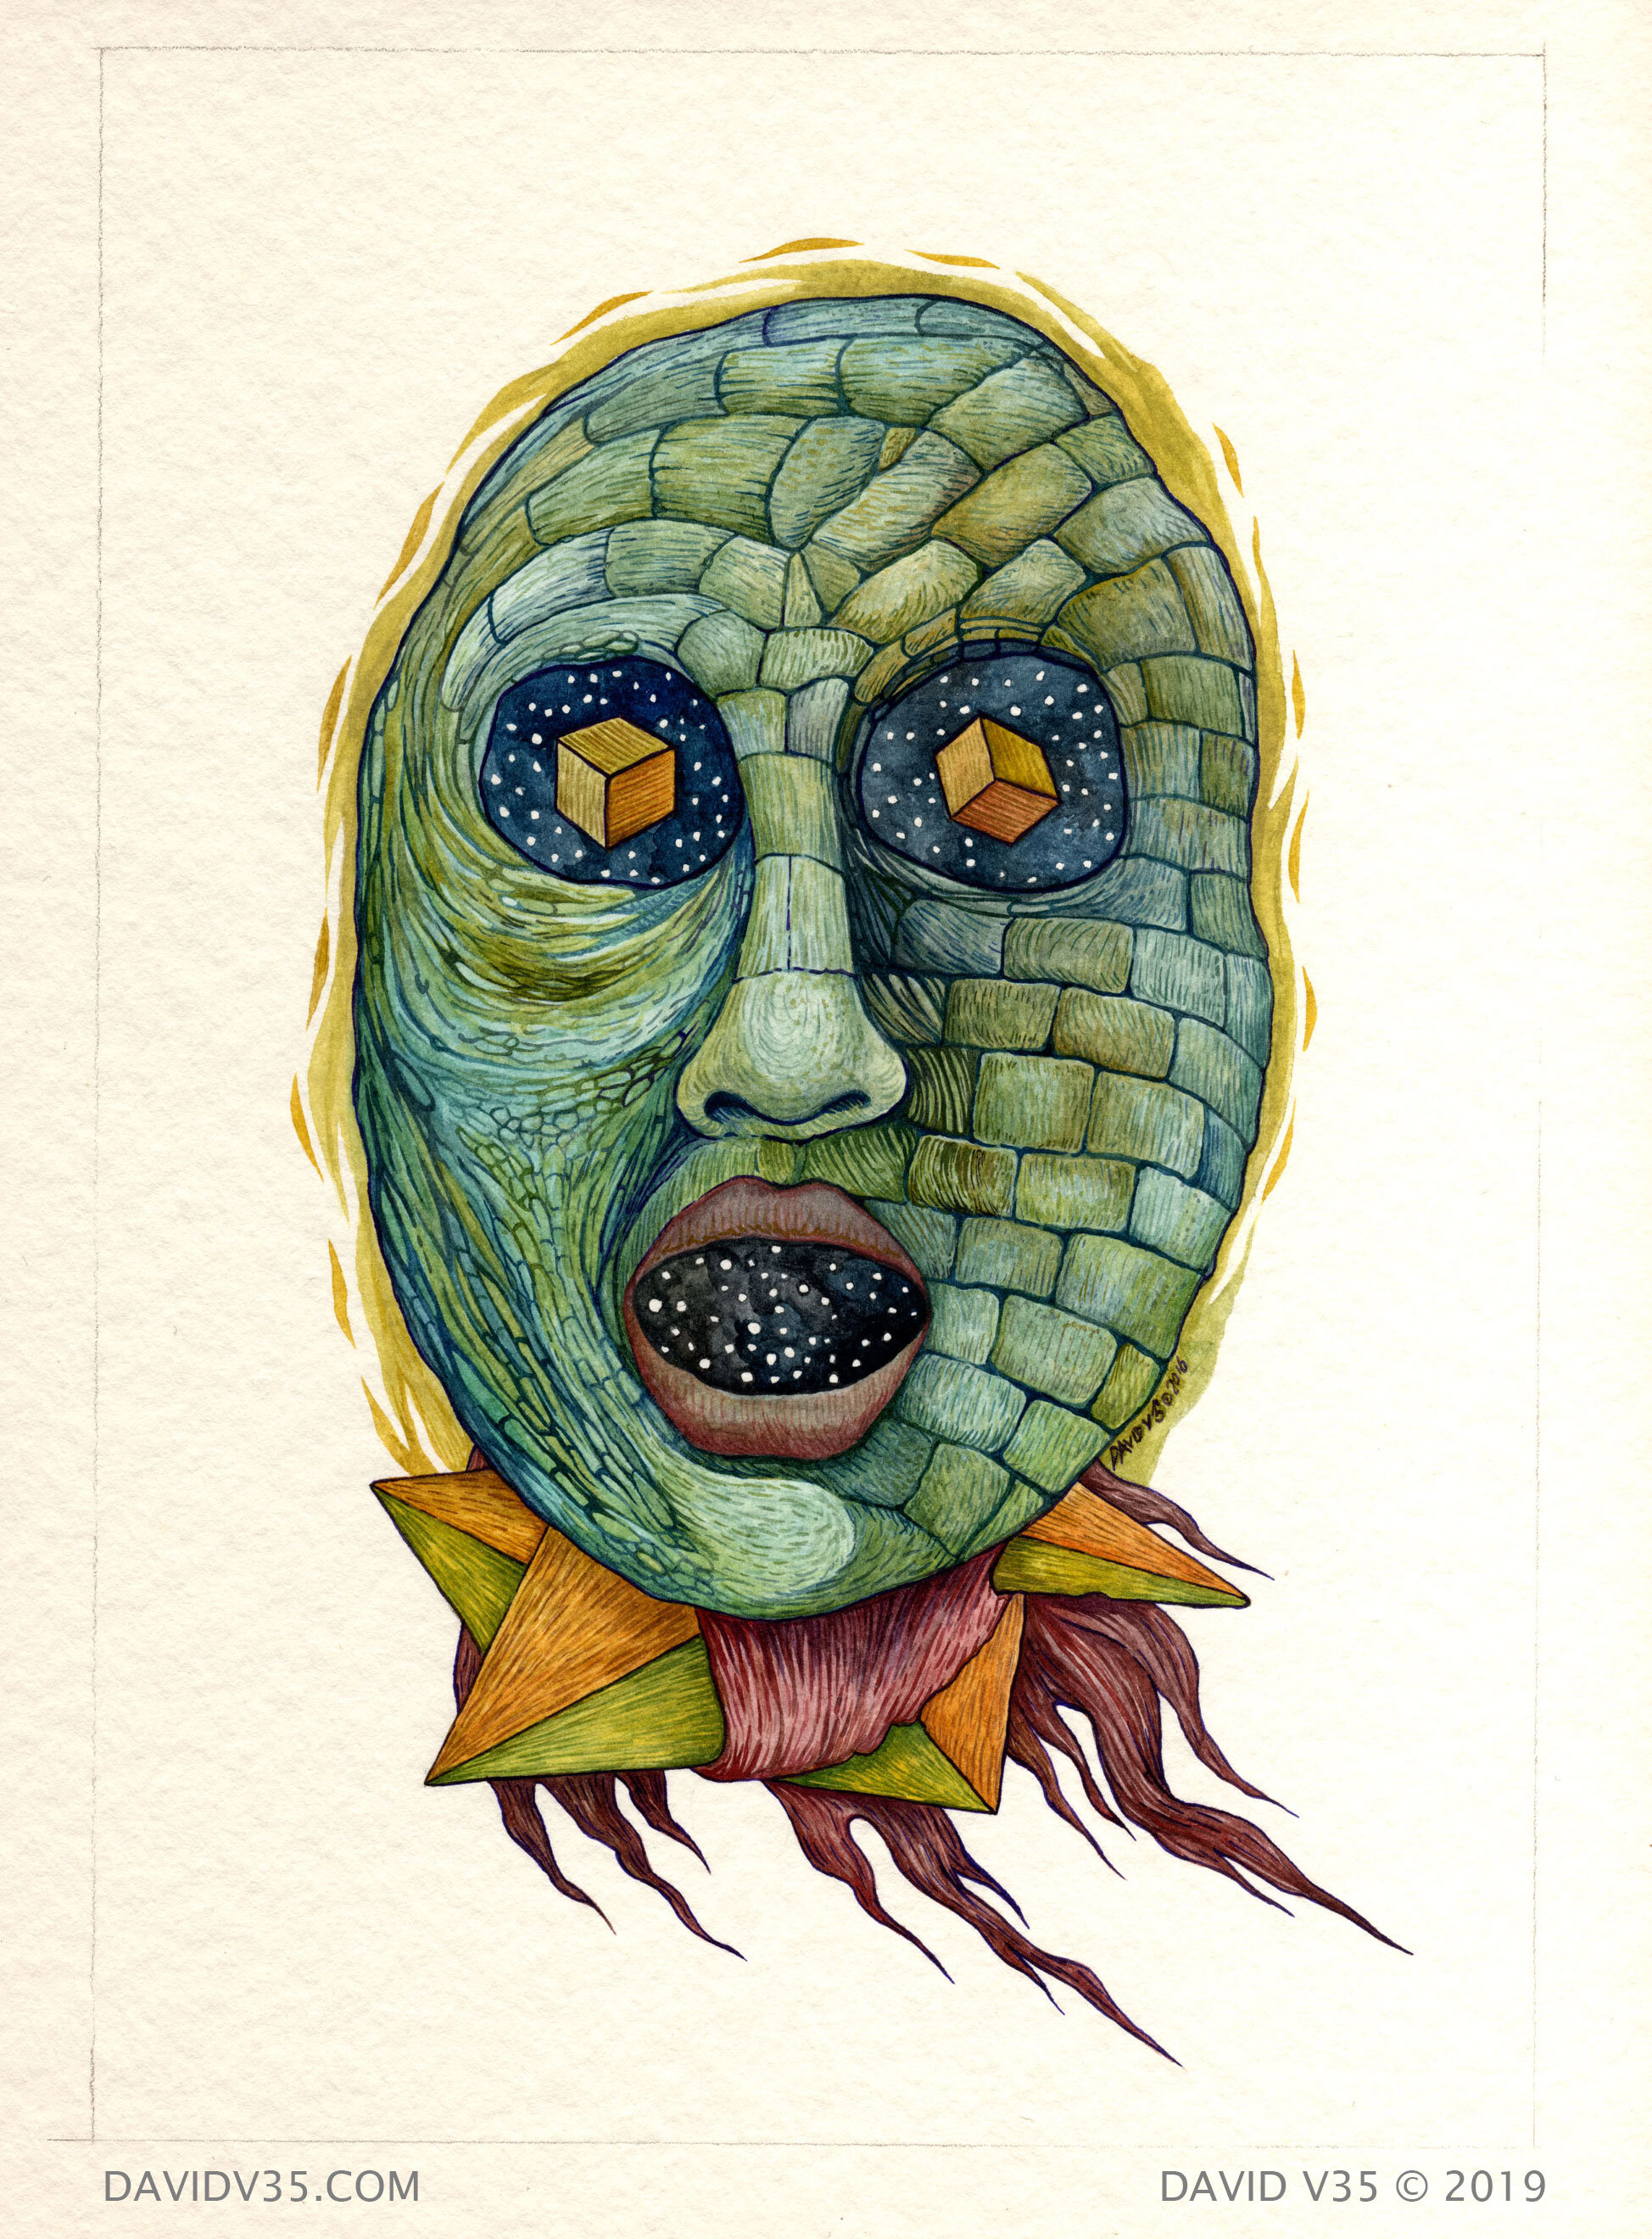 Genesis / Watercolor / 2016